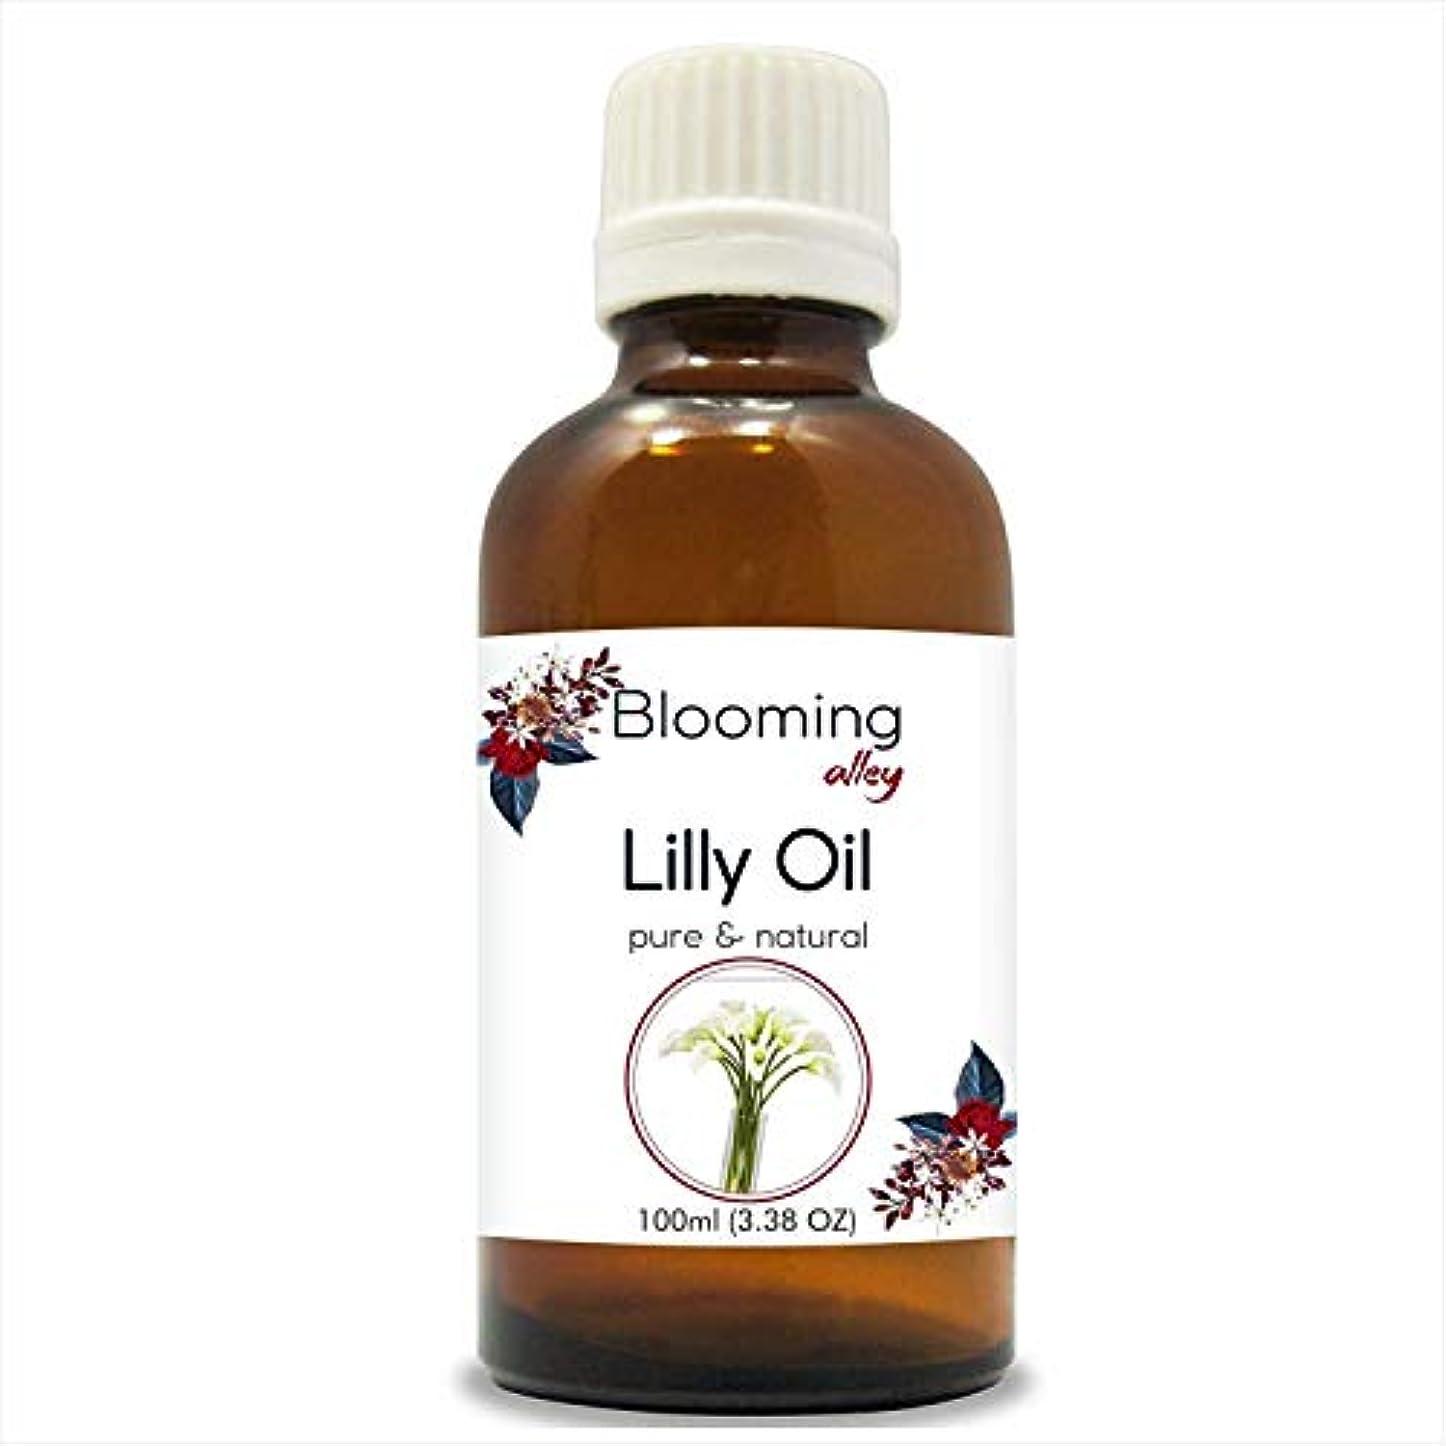 Lilly Oil (Lilium Auratum) Essential Oil 30 ml or 1.0 Fl Oz by Blooming Alley